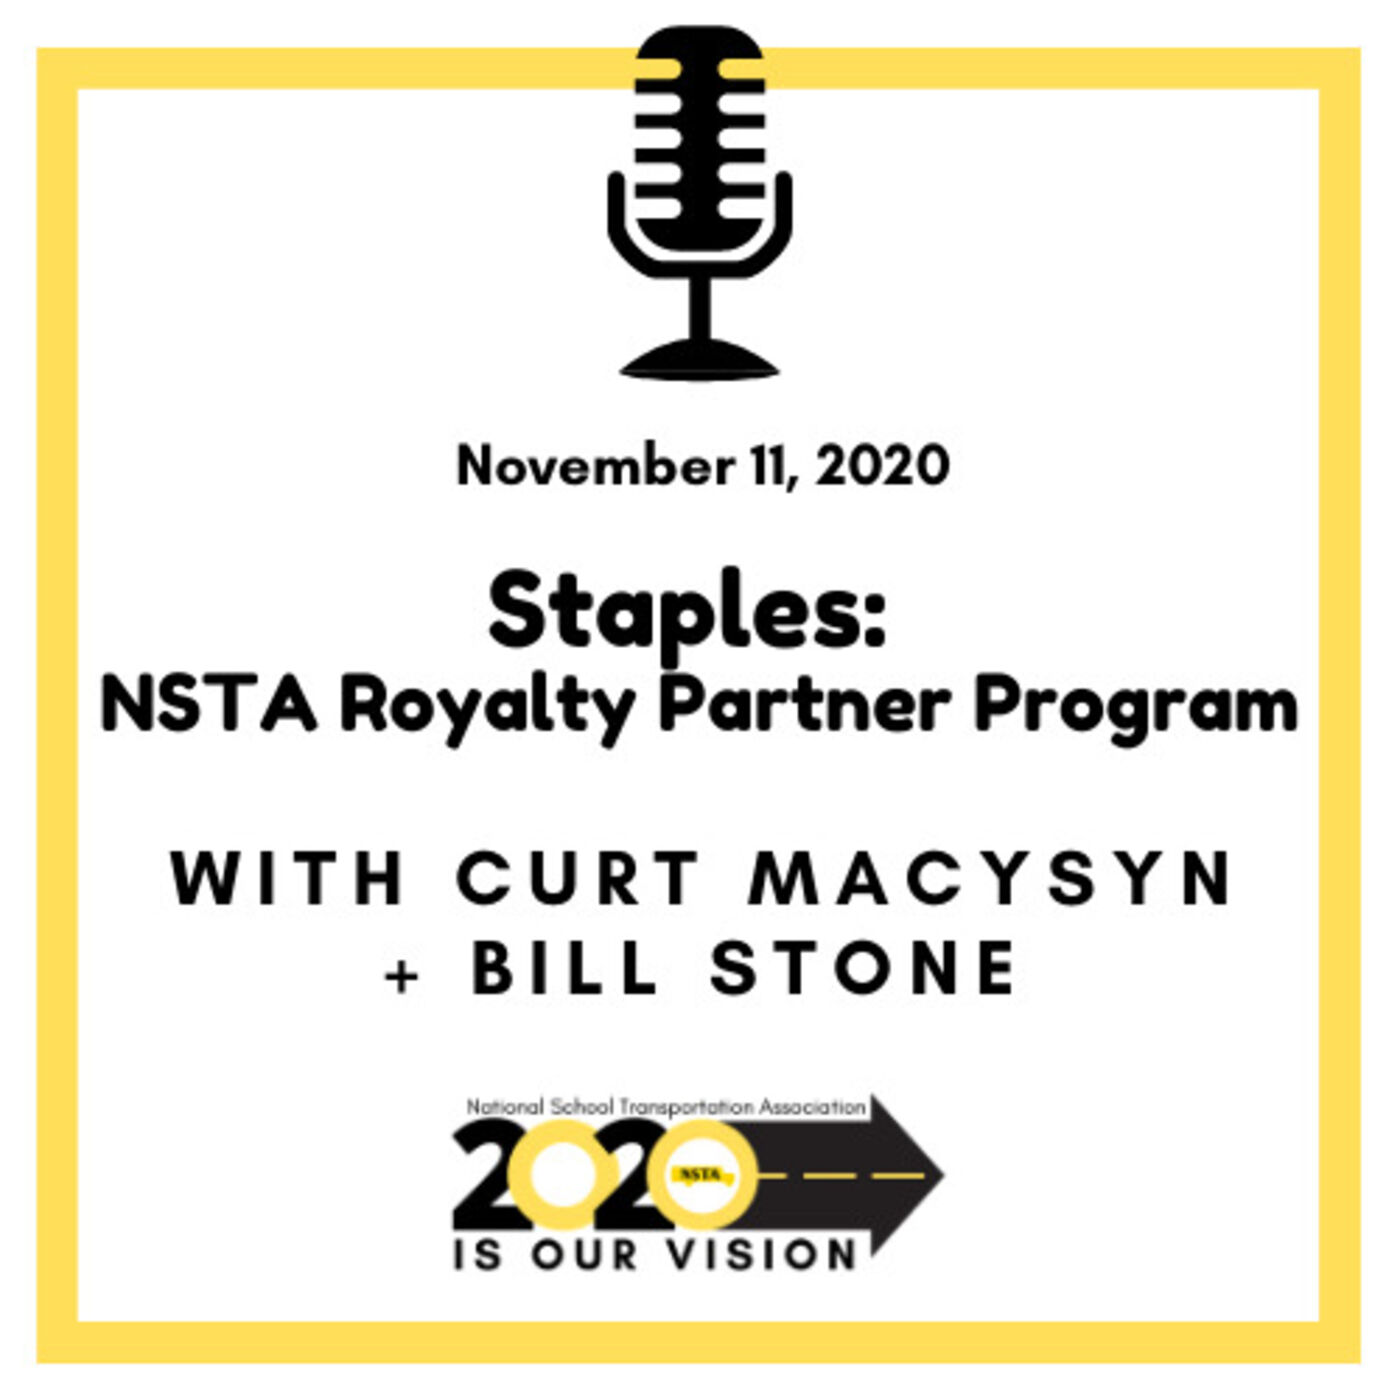 Staples-NSTA Royalty Partner Program | Bill Stone, Business Development Executive